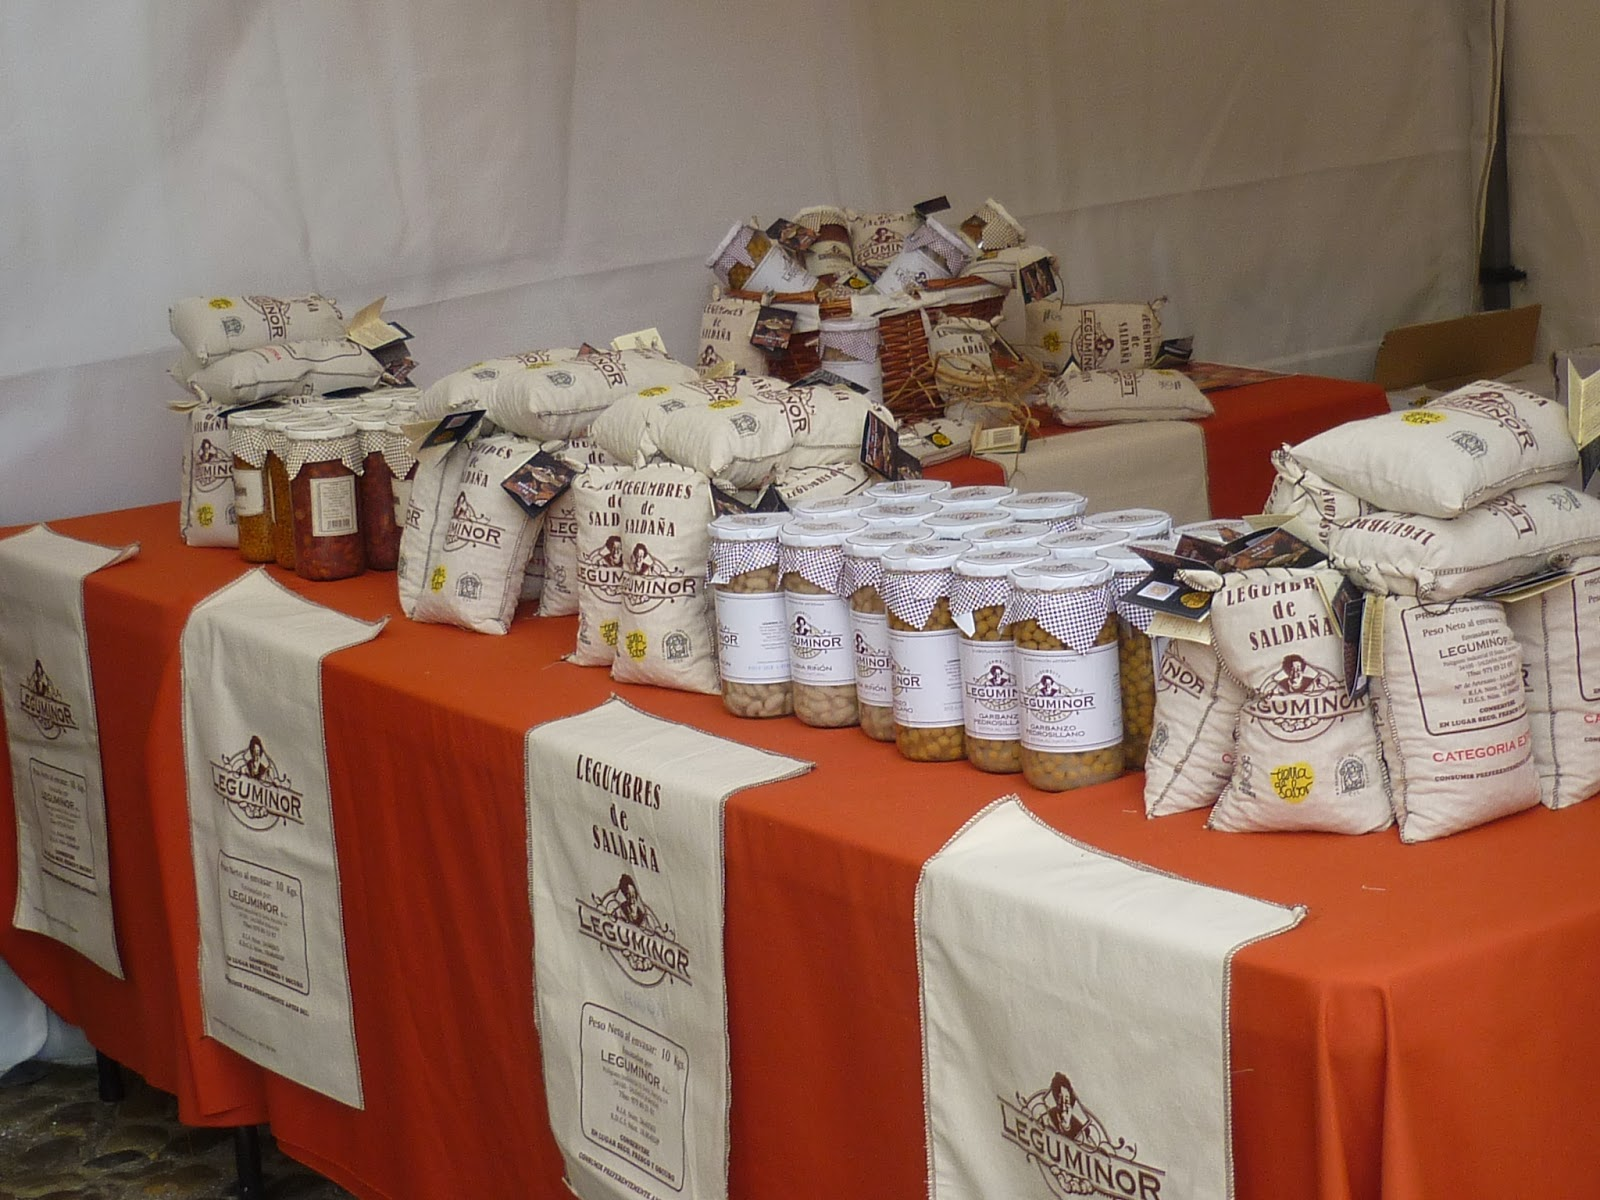 X Feria de la Alubia de Salda�a